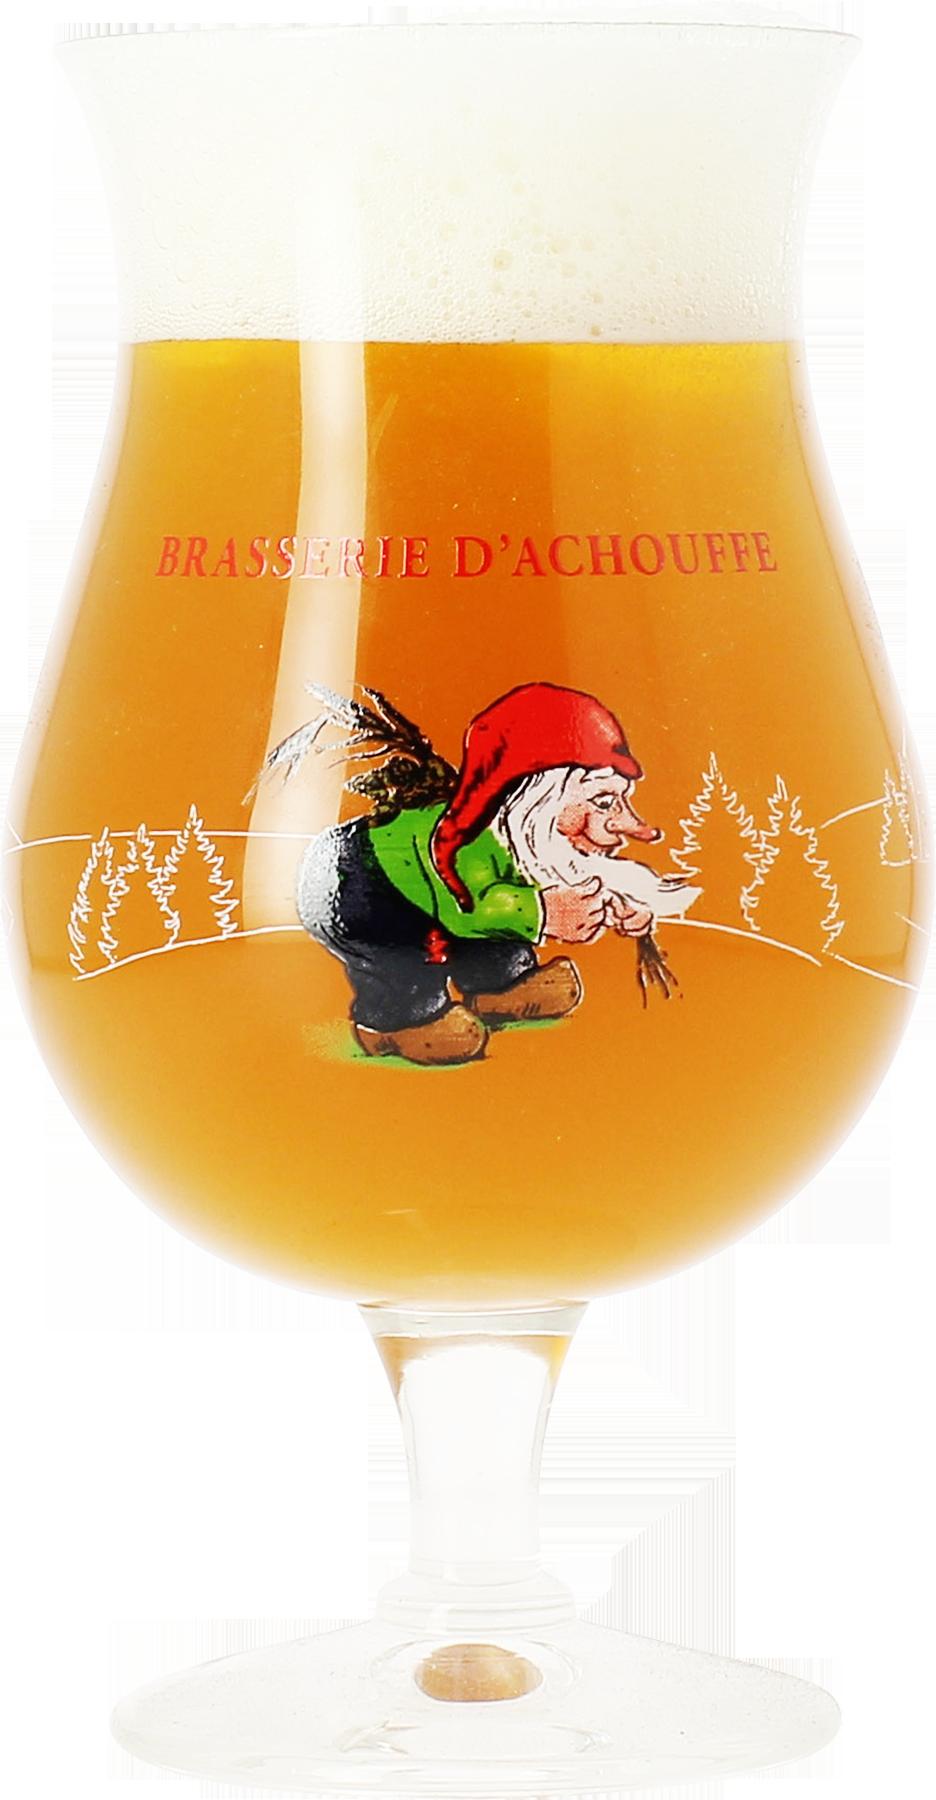 Vaso d'Achouffe 33 cl